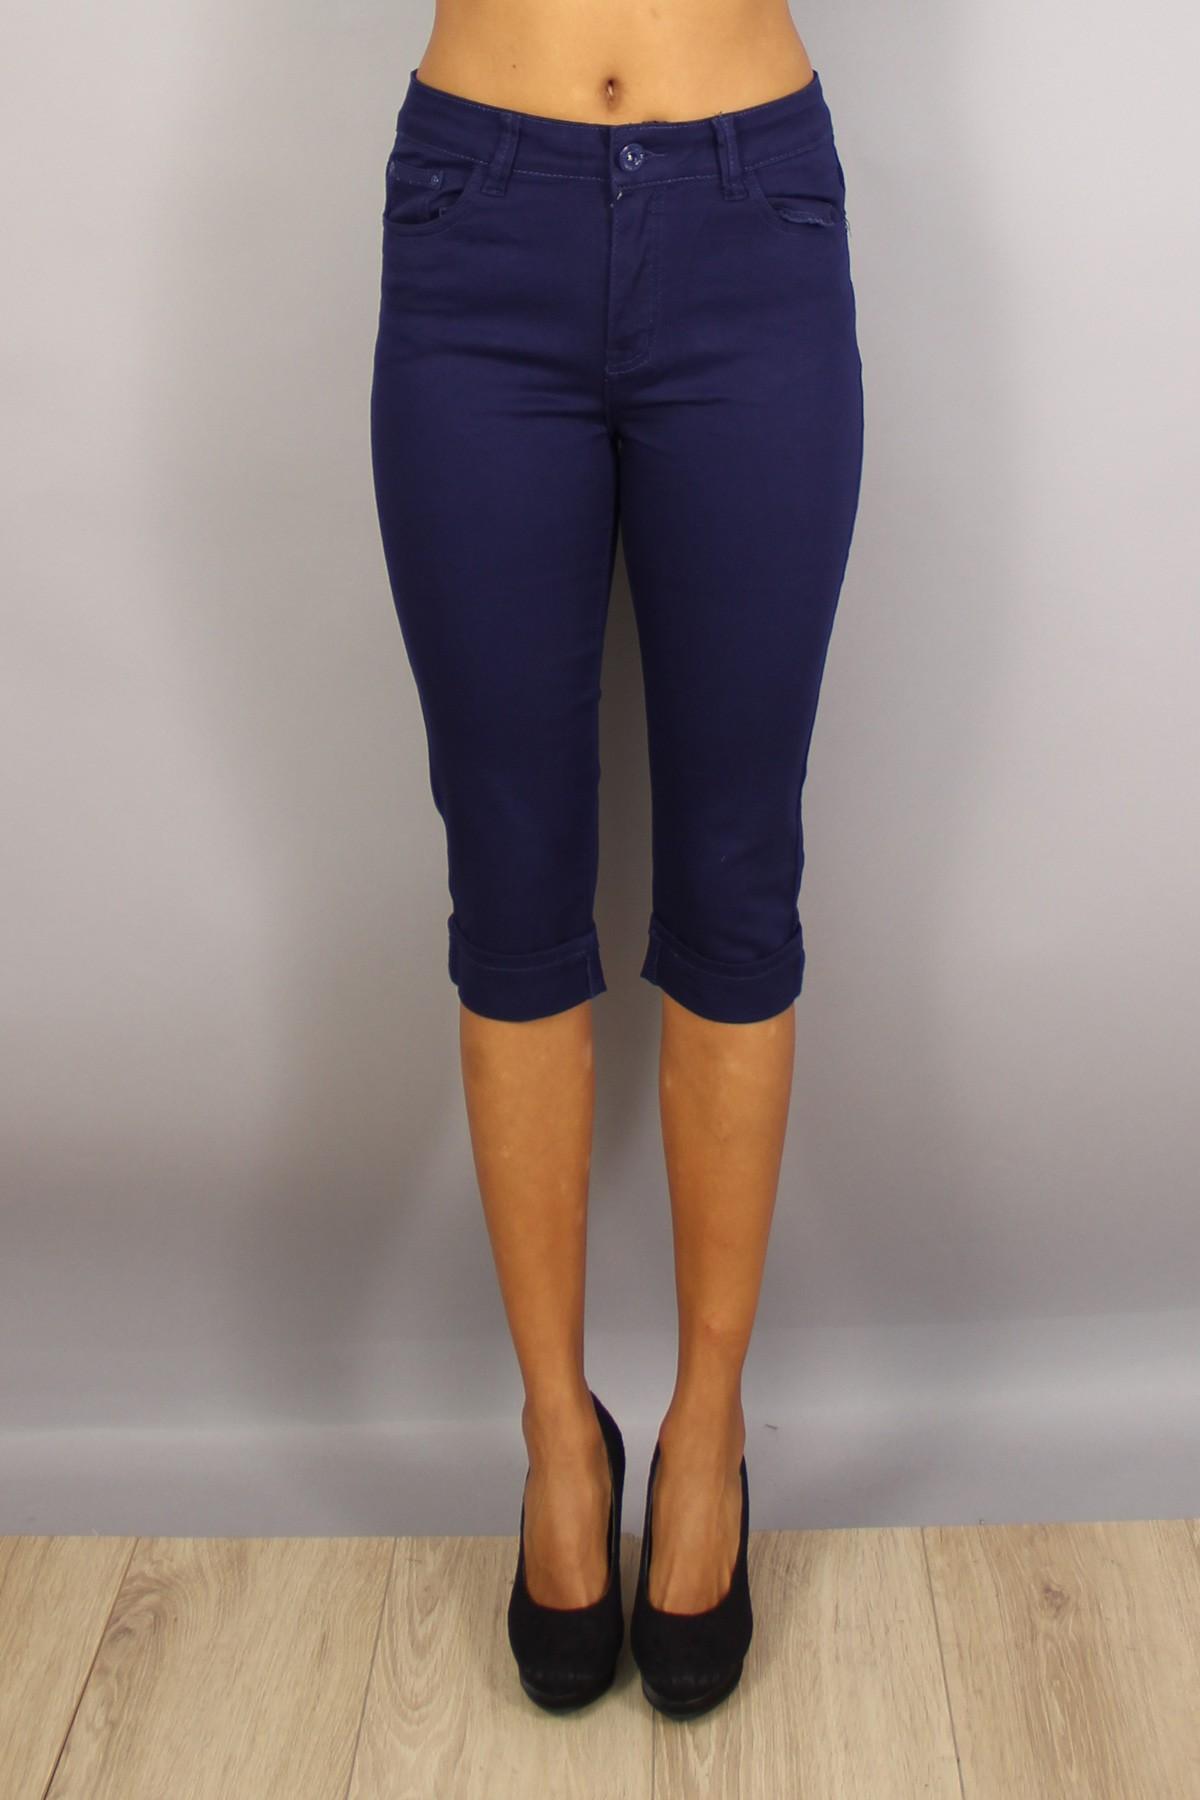 Bermuda femme marine taille haute bleu du 38 au 46